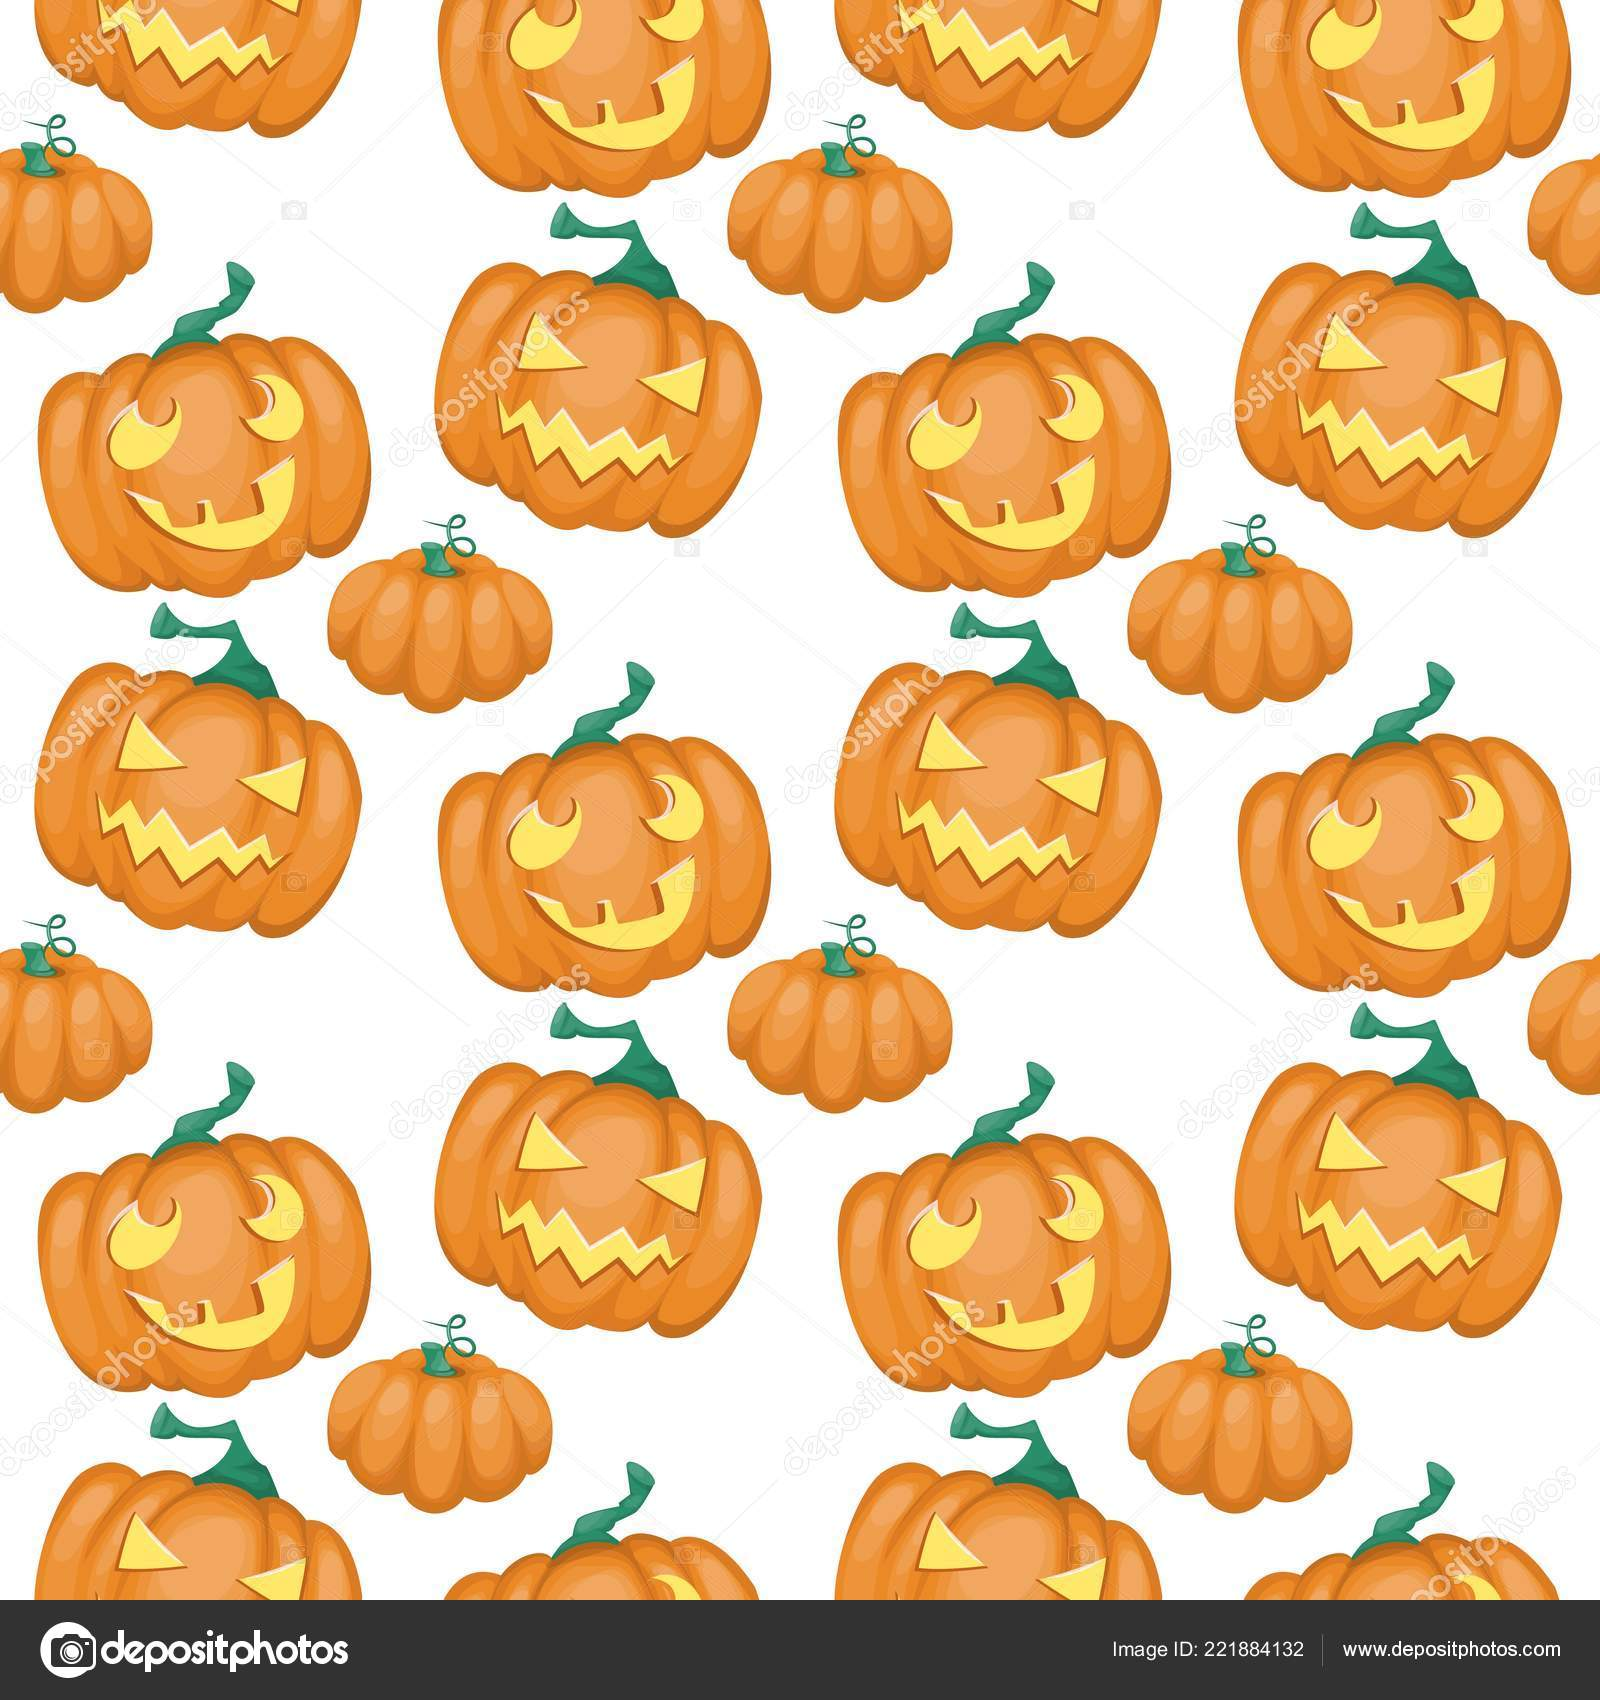 Background Trick Or Treat Wallpaper Seamless Pattern Pumpkin Happy Halloween Vector Illustration Scary Wallpaper Texture Stock Vector C Danyliuki 221884132